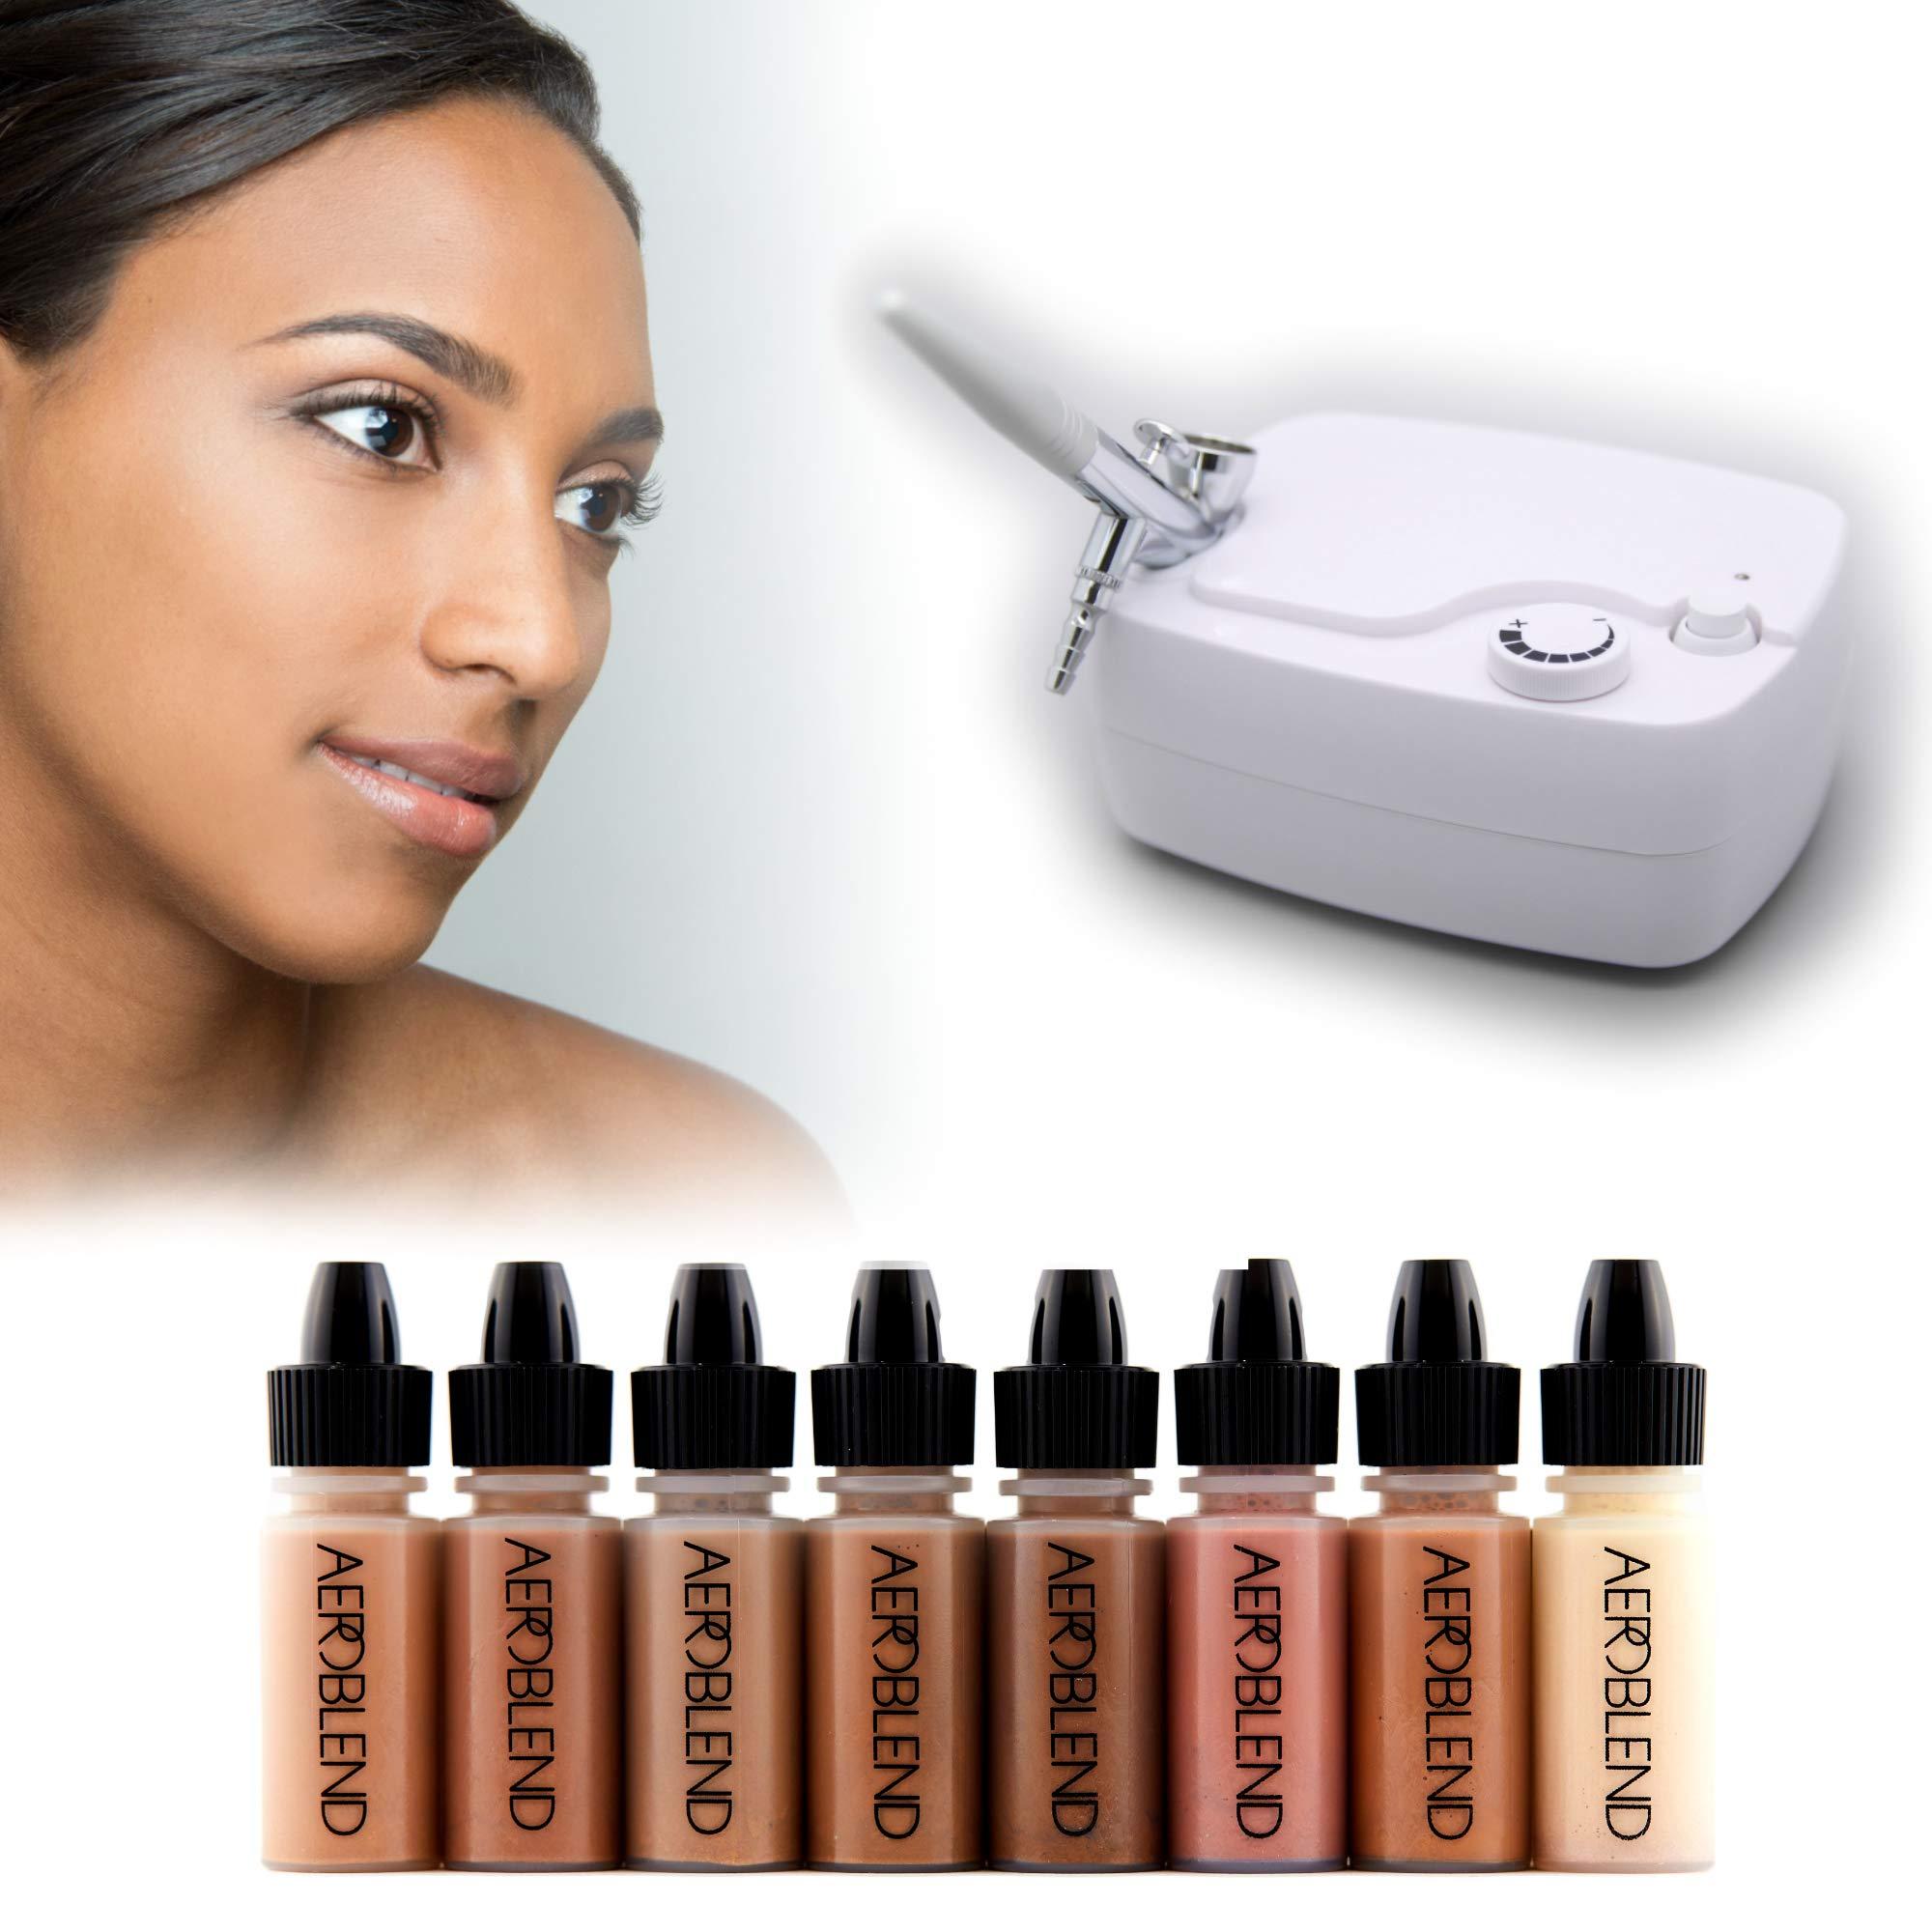 Aeroblend Airbrush Makeup Personal Starter Kit - Professional Cosmetic Airbrush Makeup System - DARK Foundation - Color Match Guarantee